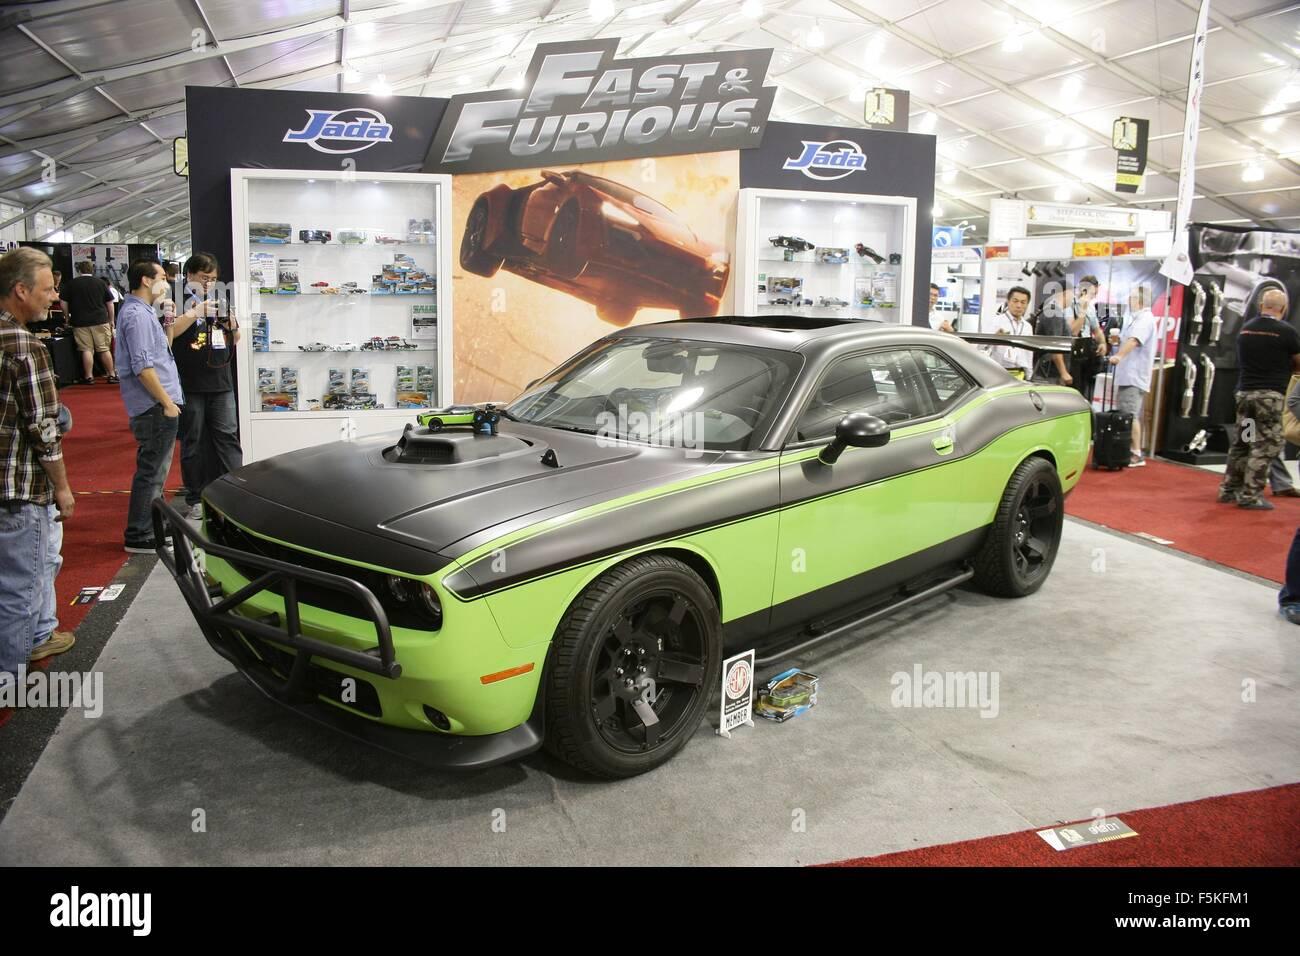 Las Vegas NV USA 5th Nov 2015 2015 Dodge Challenger Car from